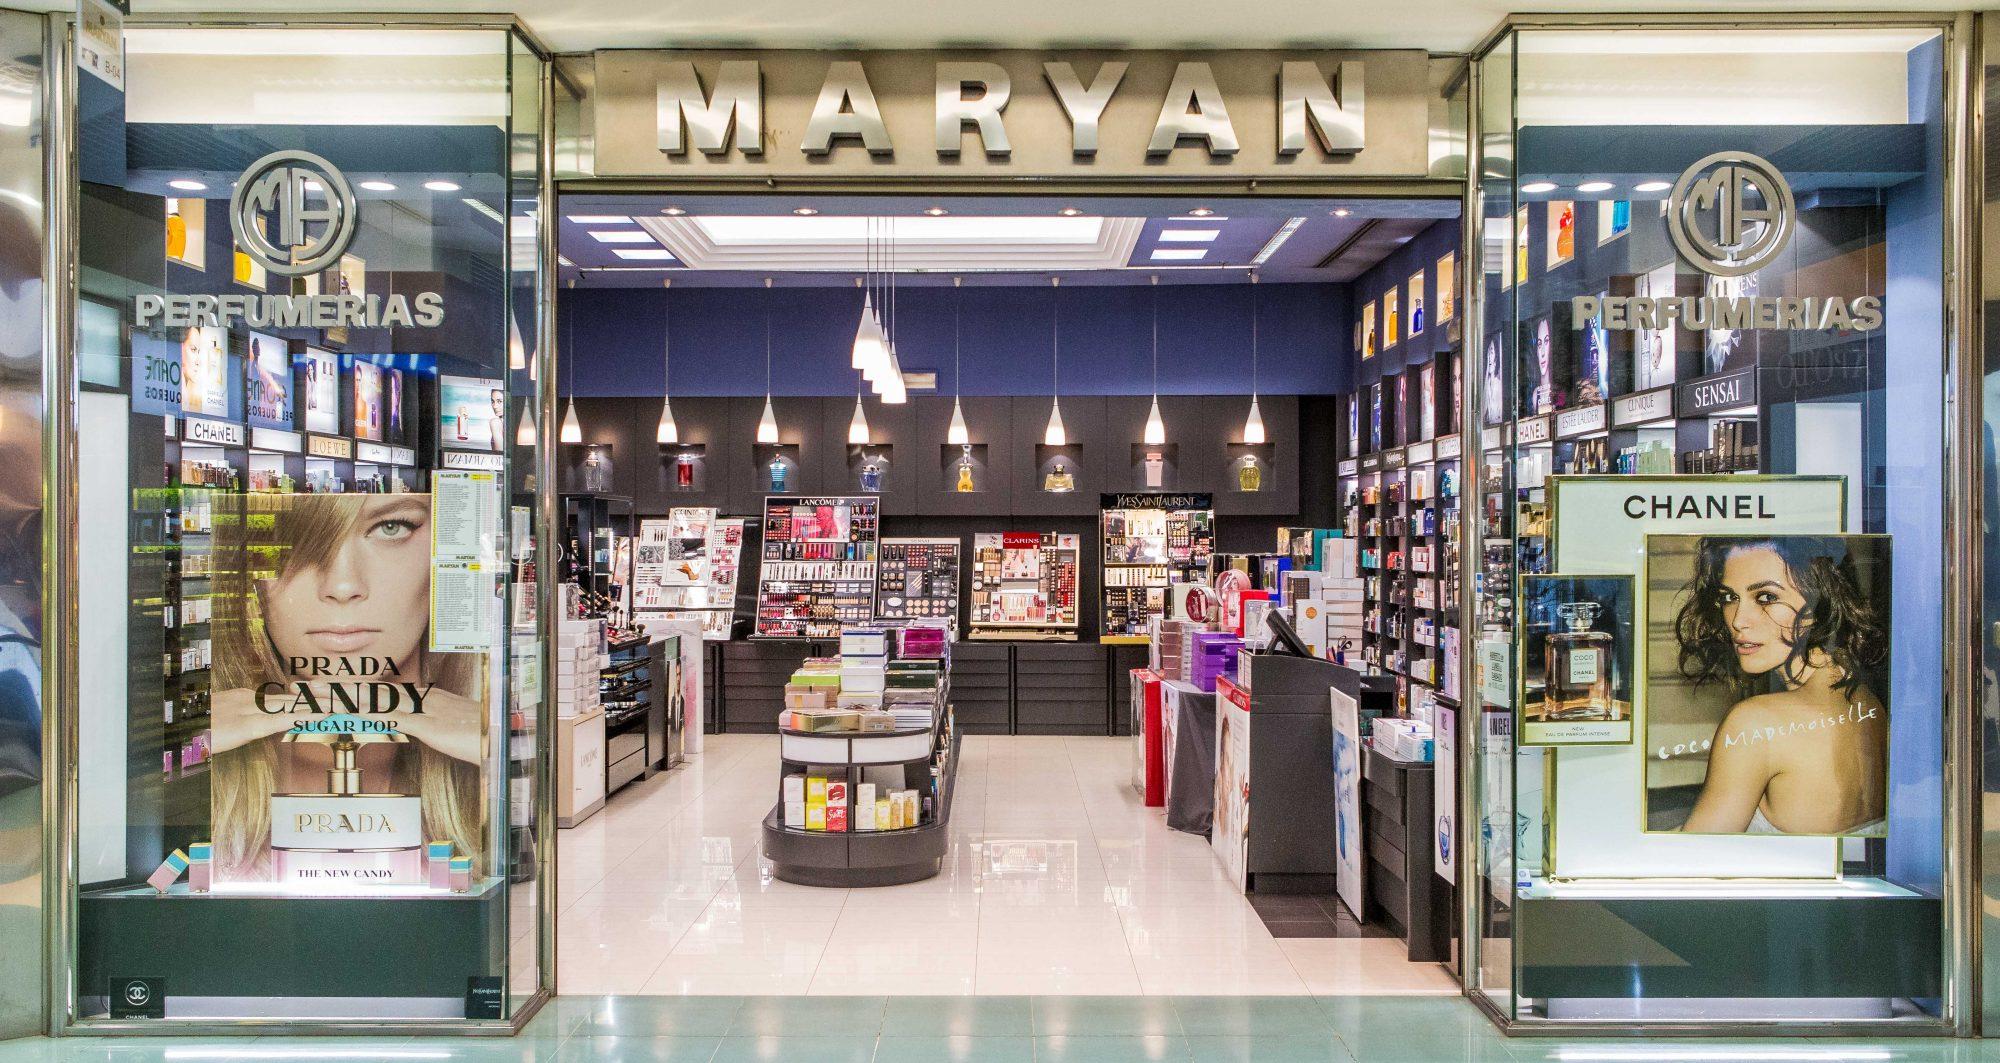 Perfumerías Maryan